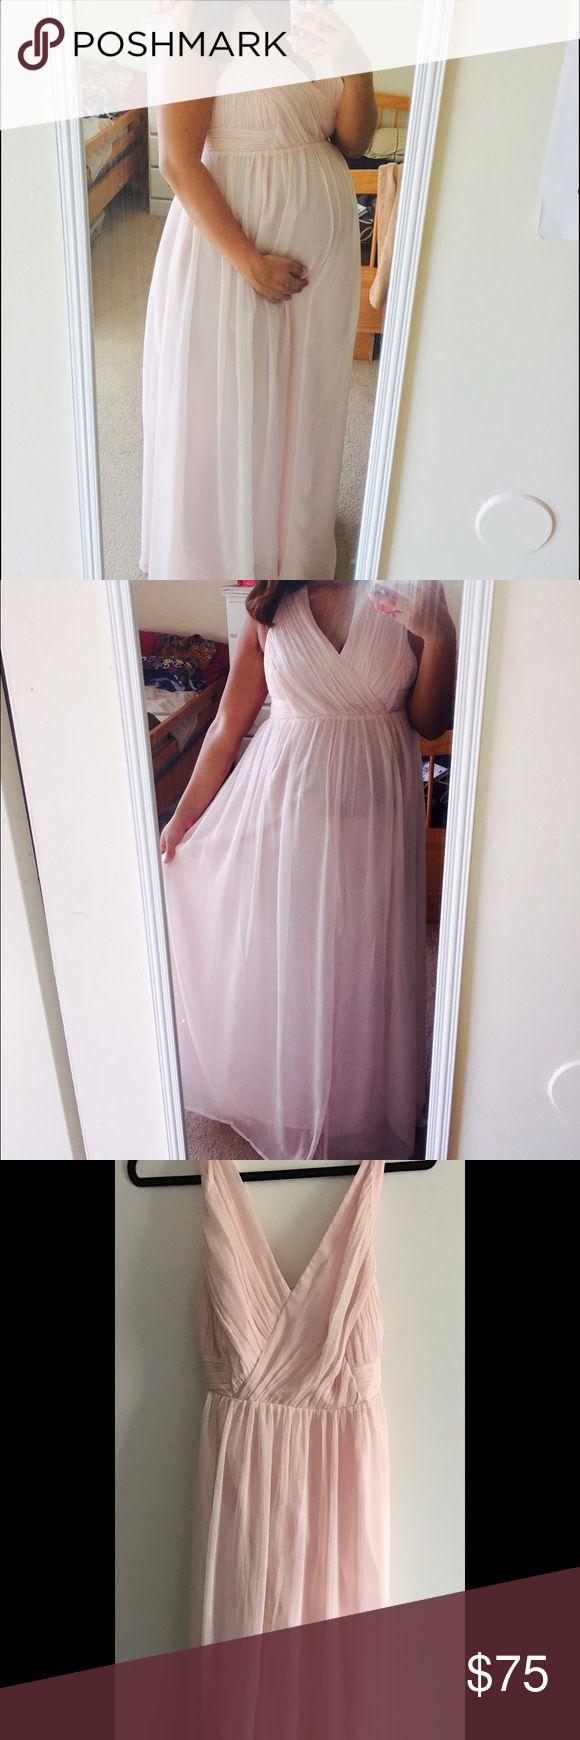 Jessica simpson wedding dress  Jessica Simpson Bohemian Style Maternity Dress Jessica Simpson